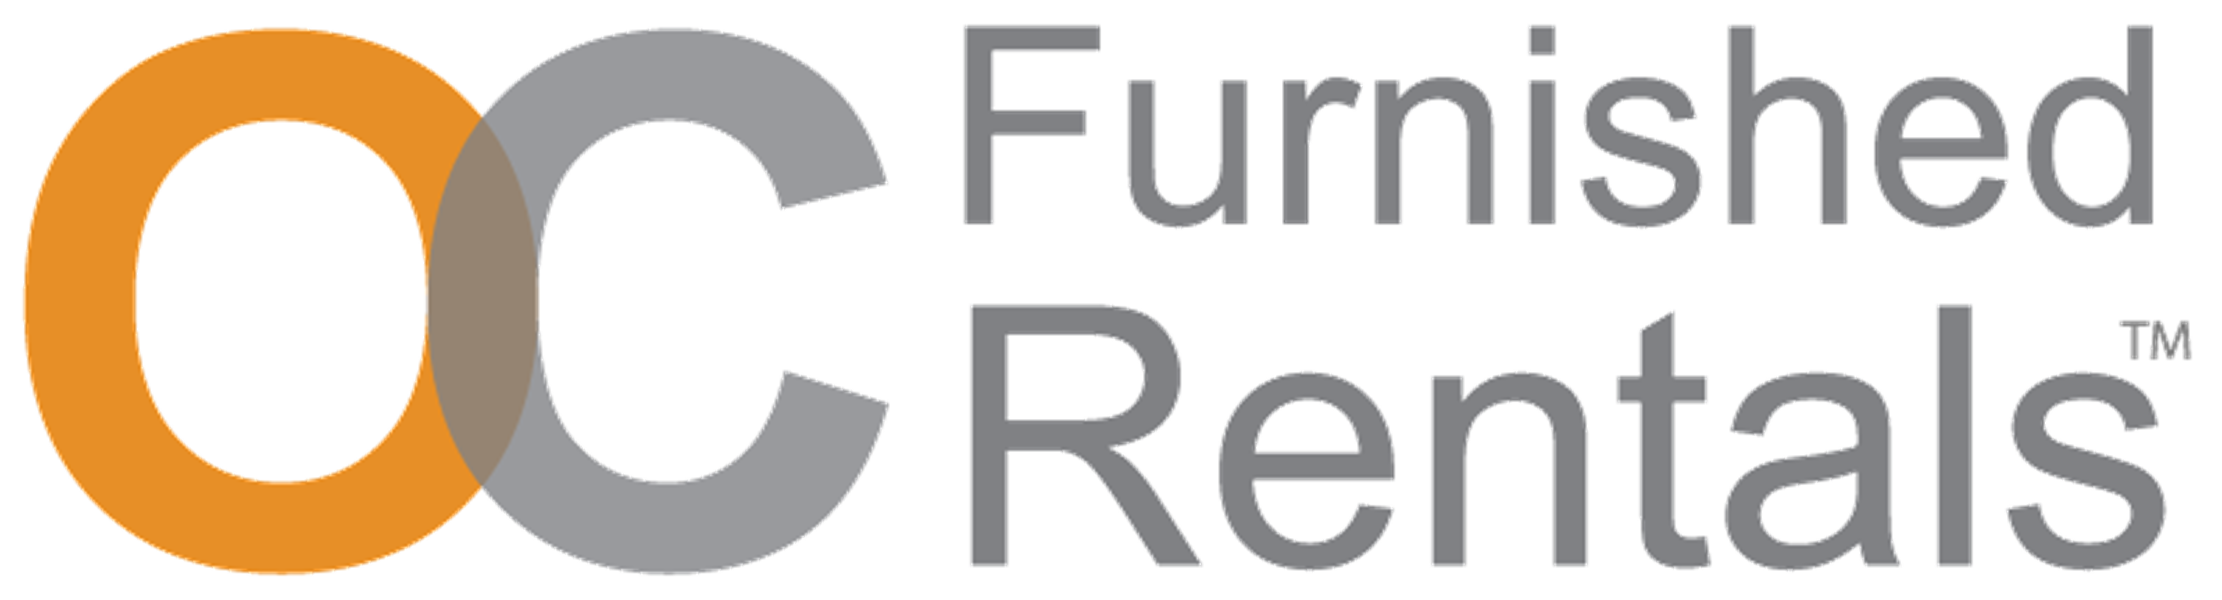 OC Furnished Rentals